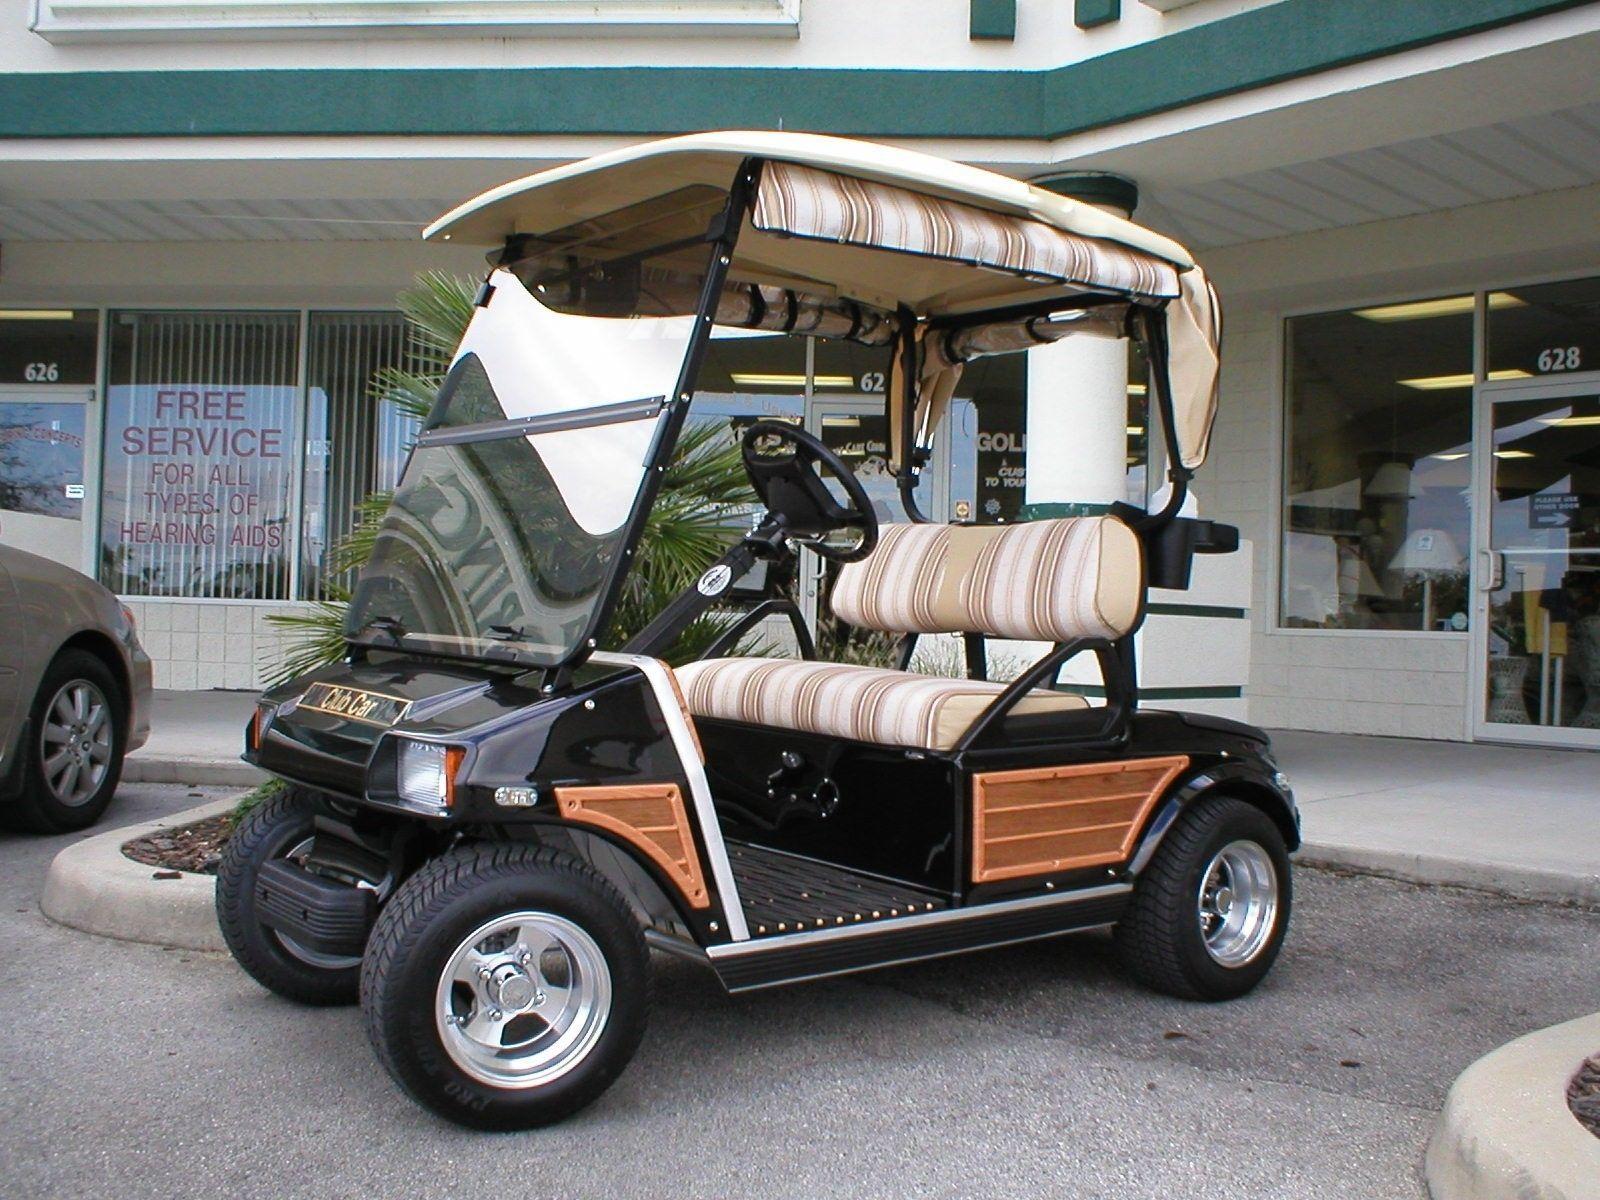 Club Car DS Model Golf Cart Woody Kit | golf carts | Pinterest ... Woody Golf Cart Wheels on 2002 chrysler gem cart, car cart, box cart,